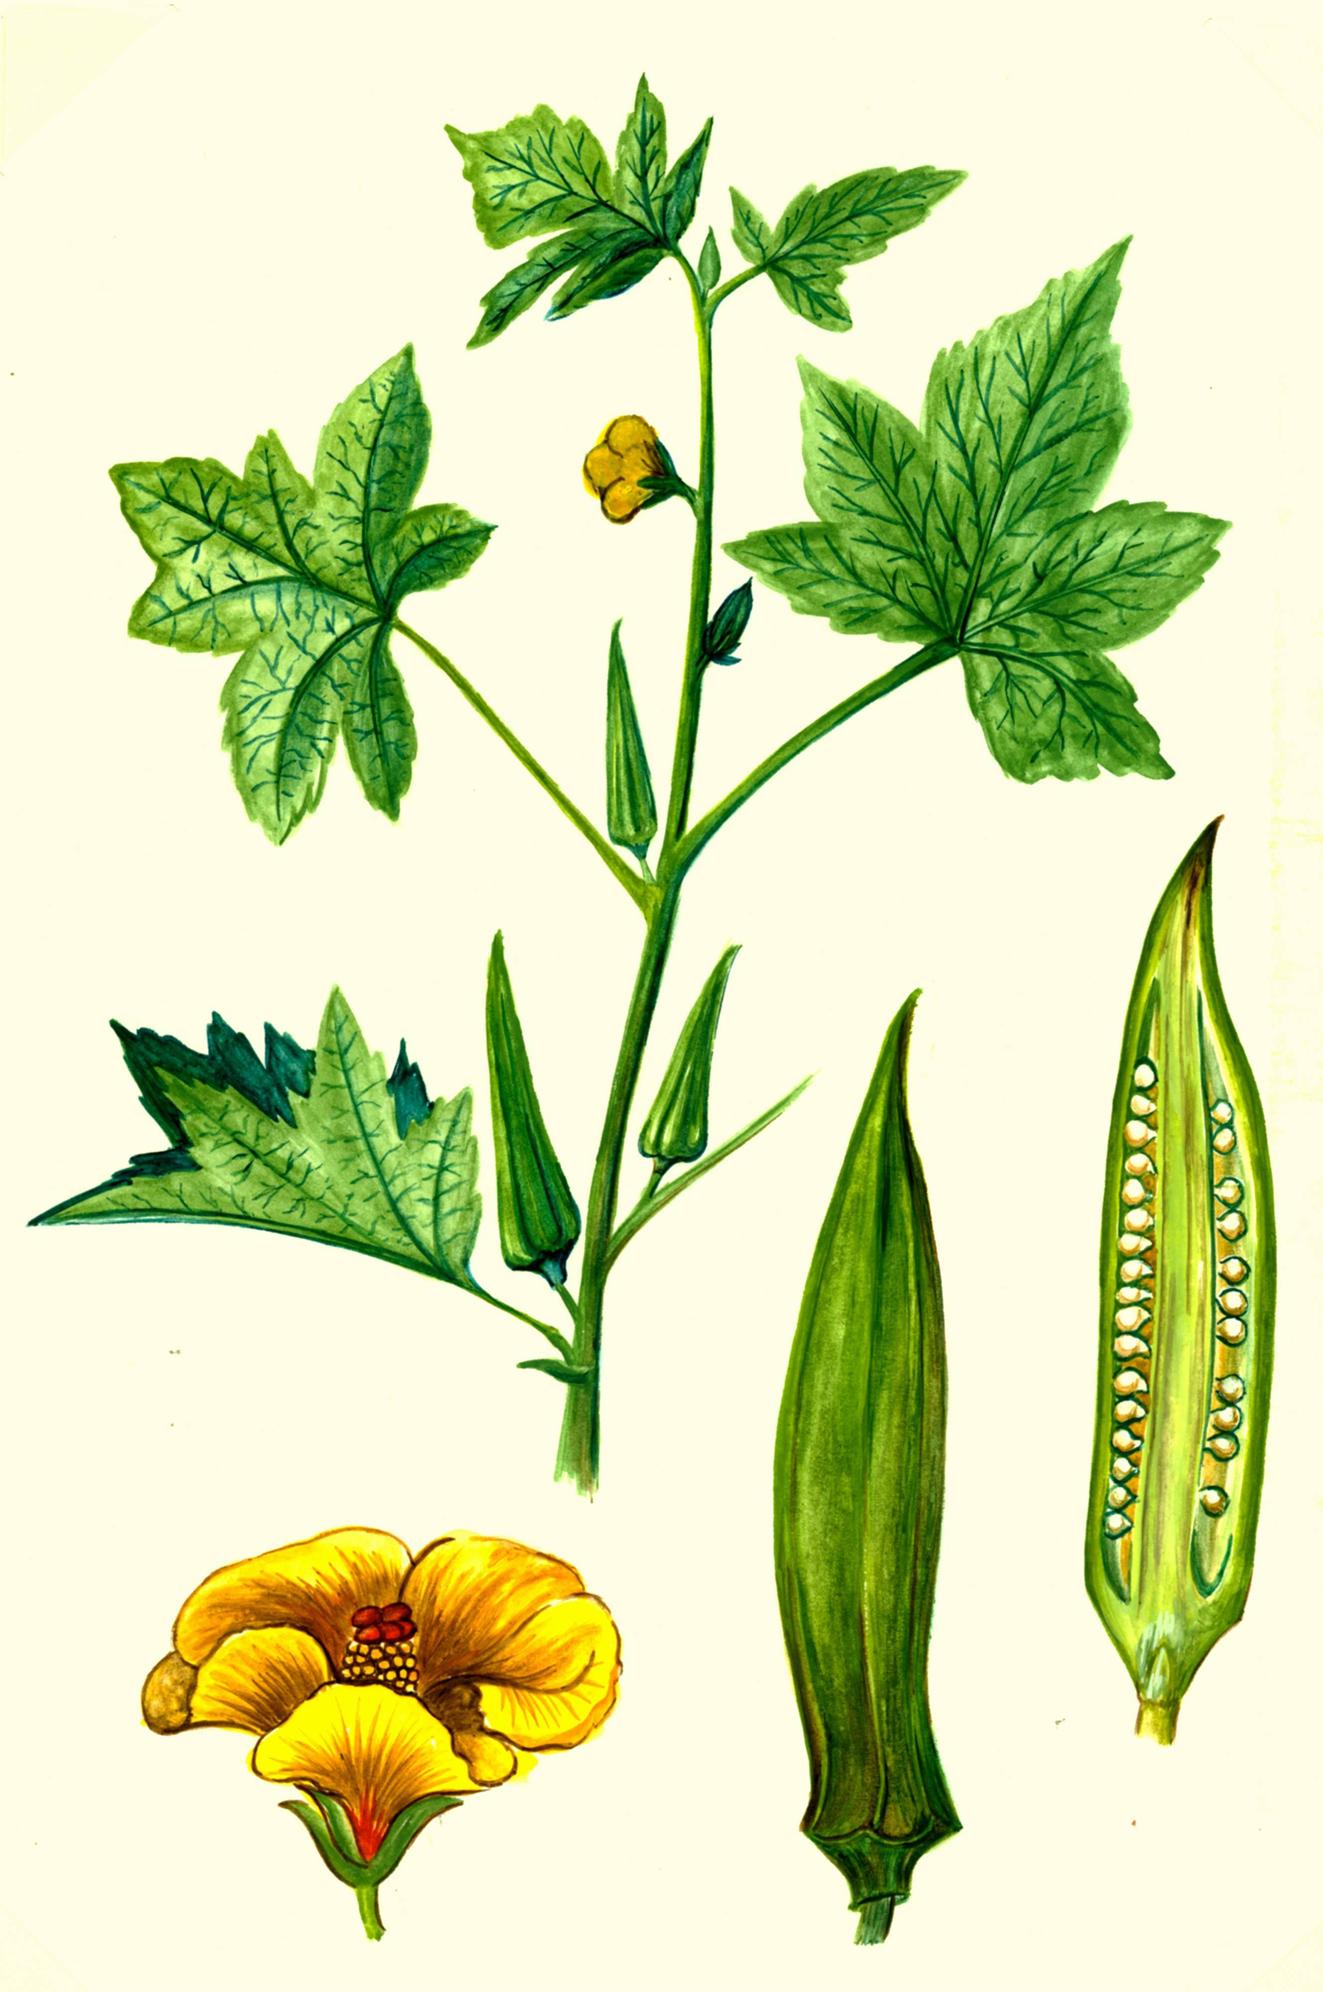 Illustration-of-Okra-plant